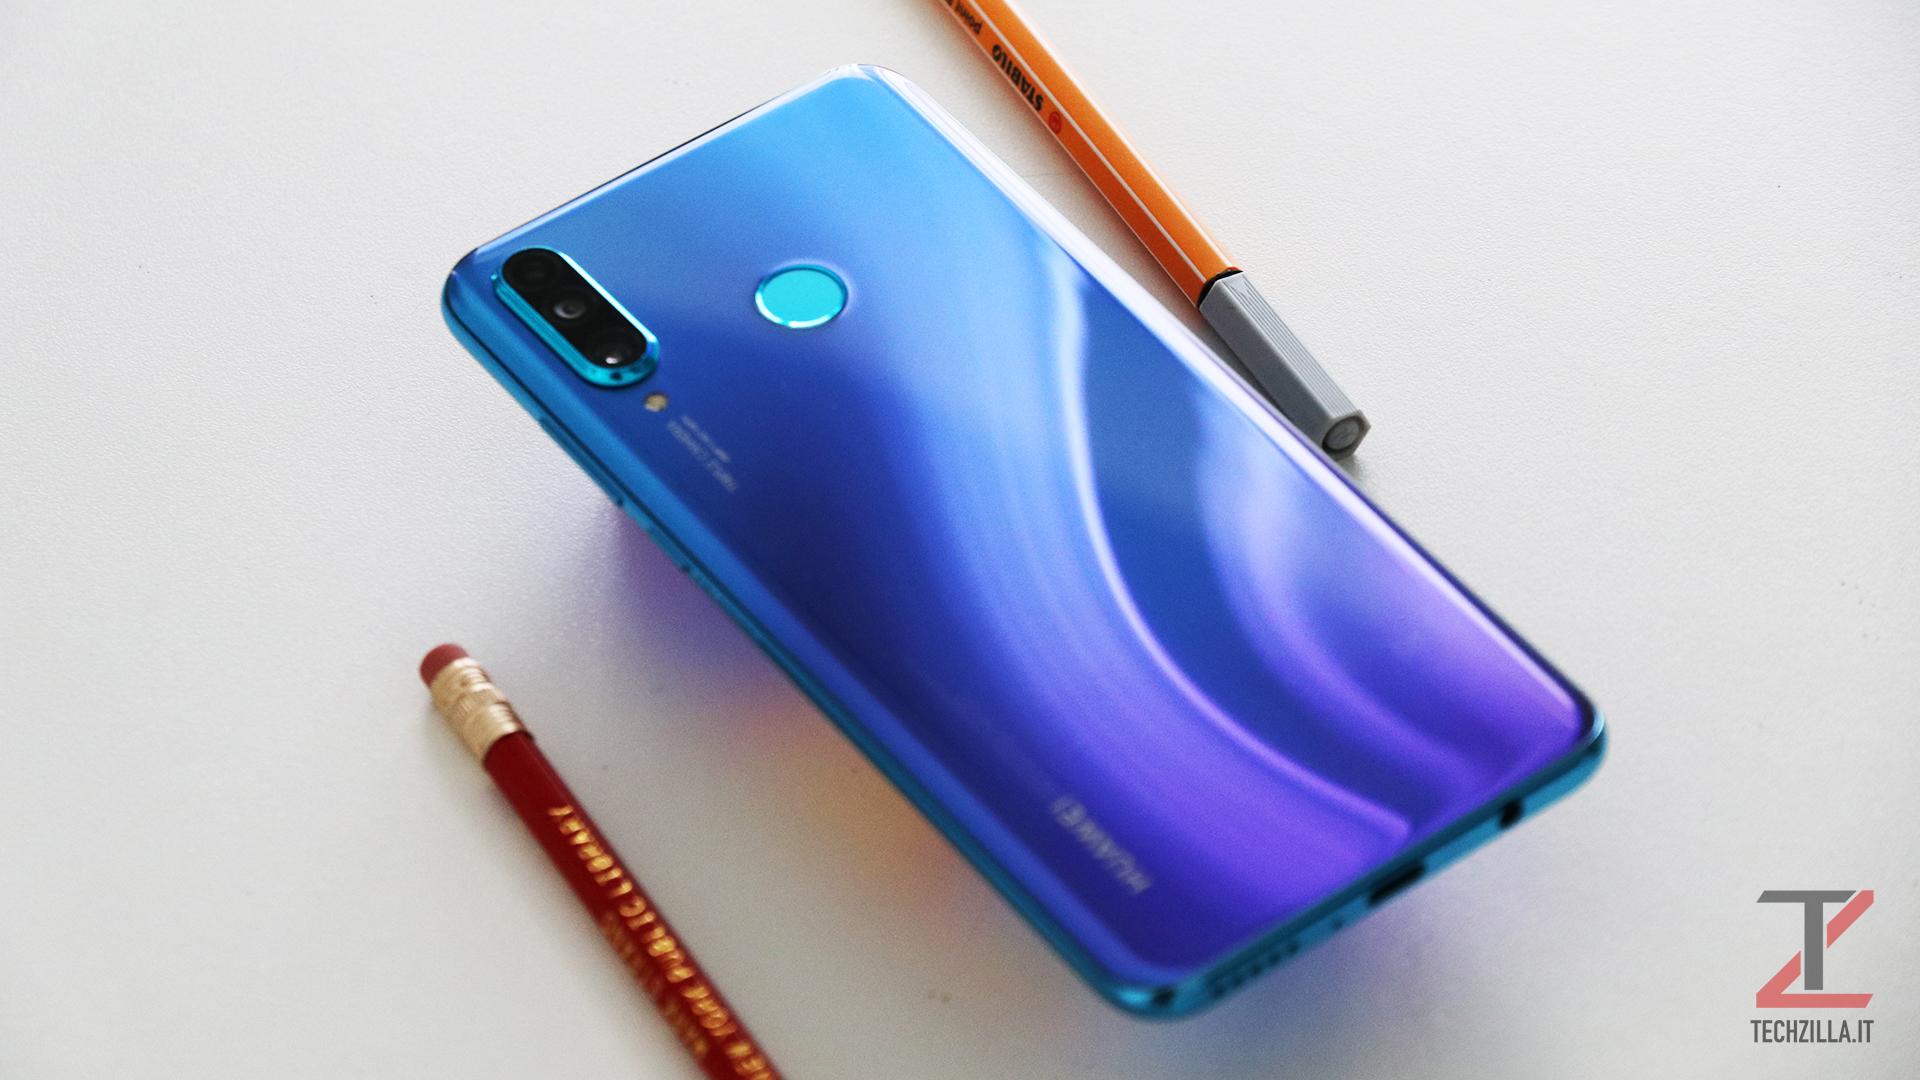 Huawei P30 Lite design